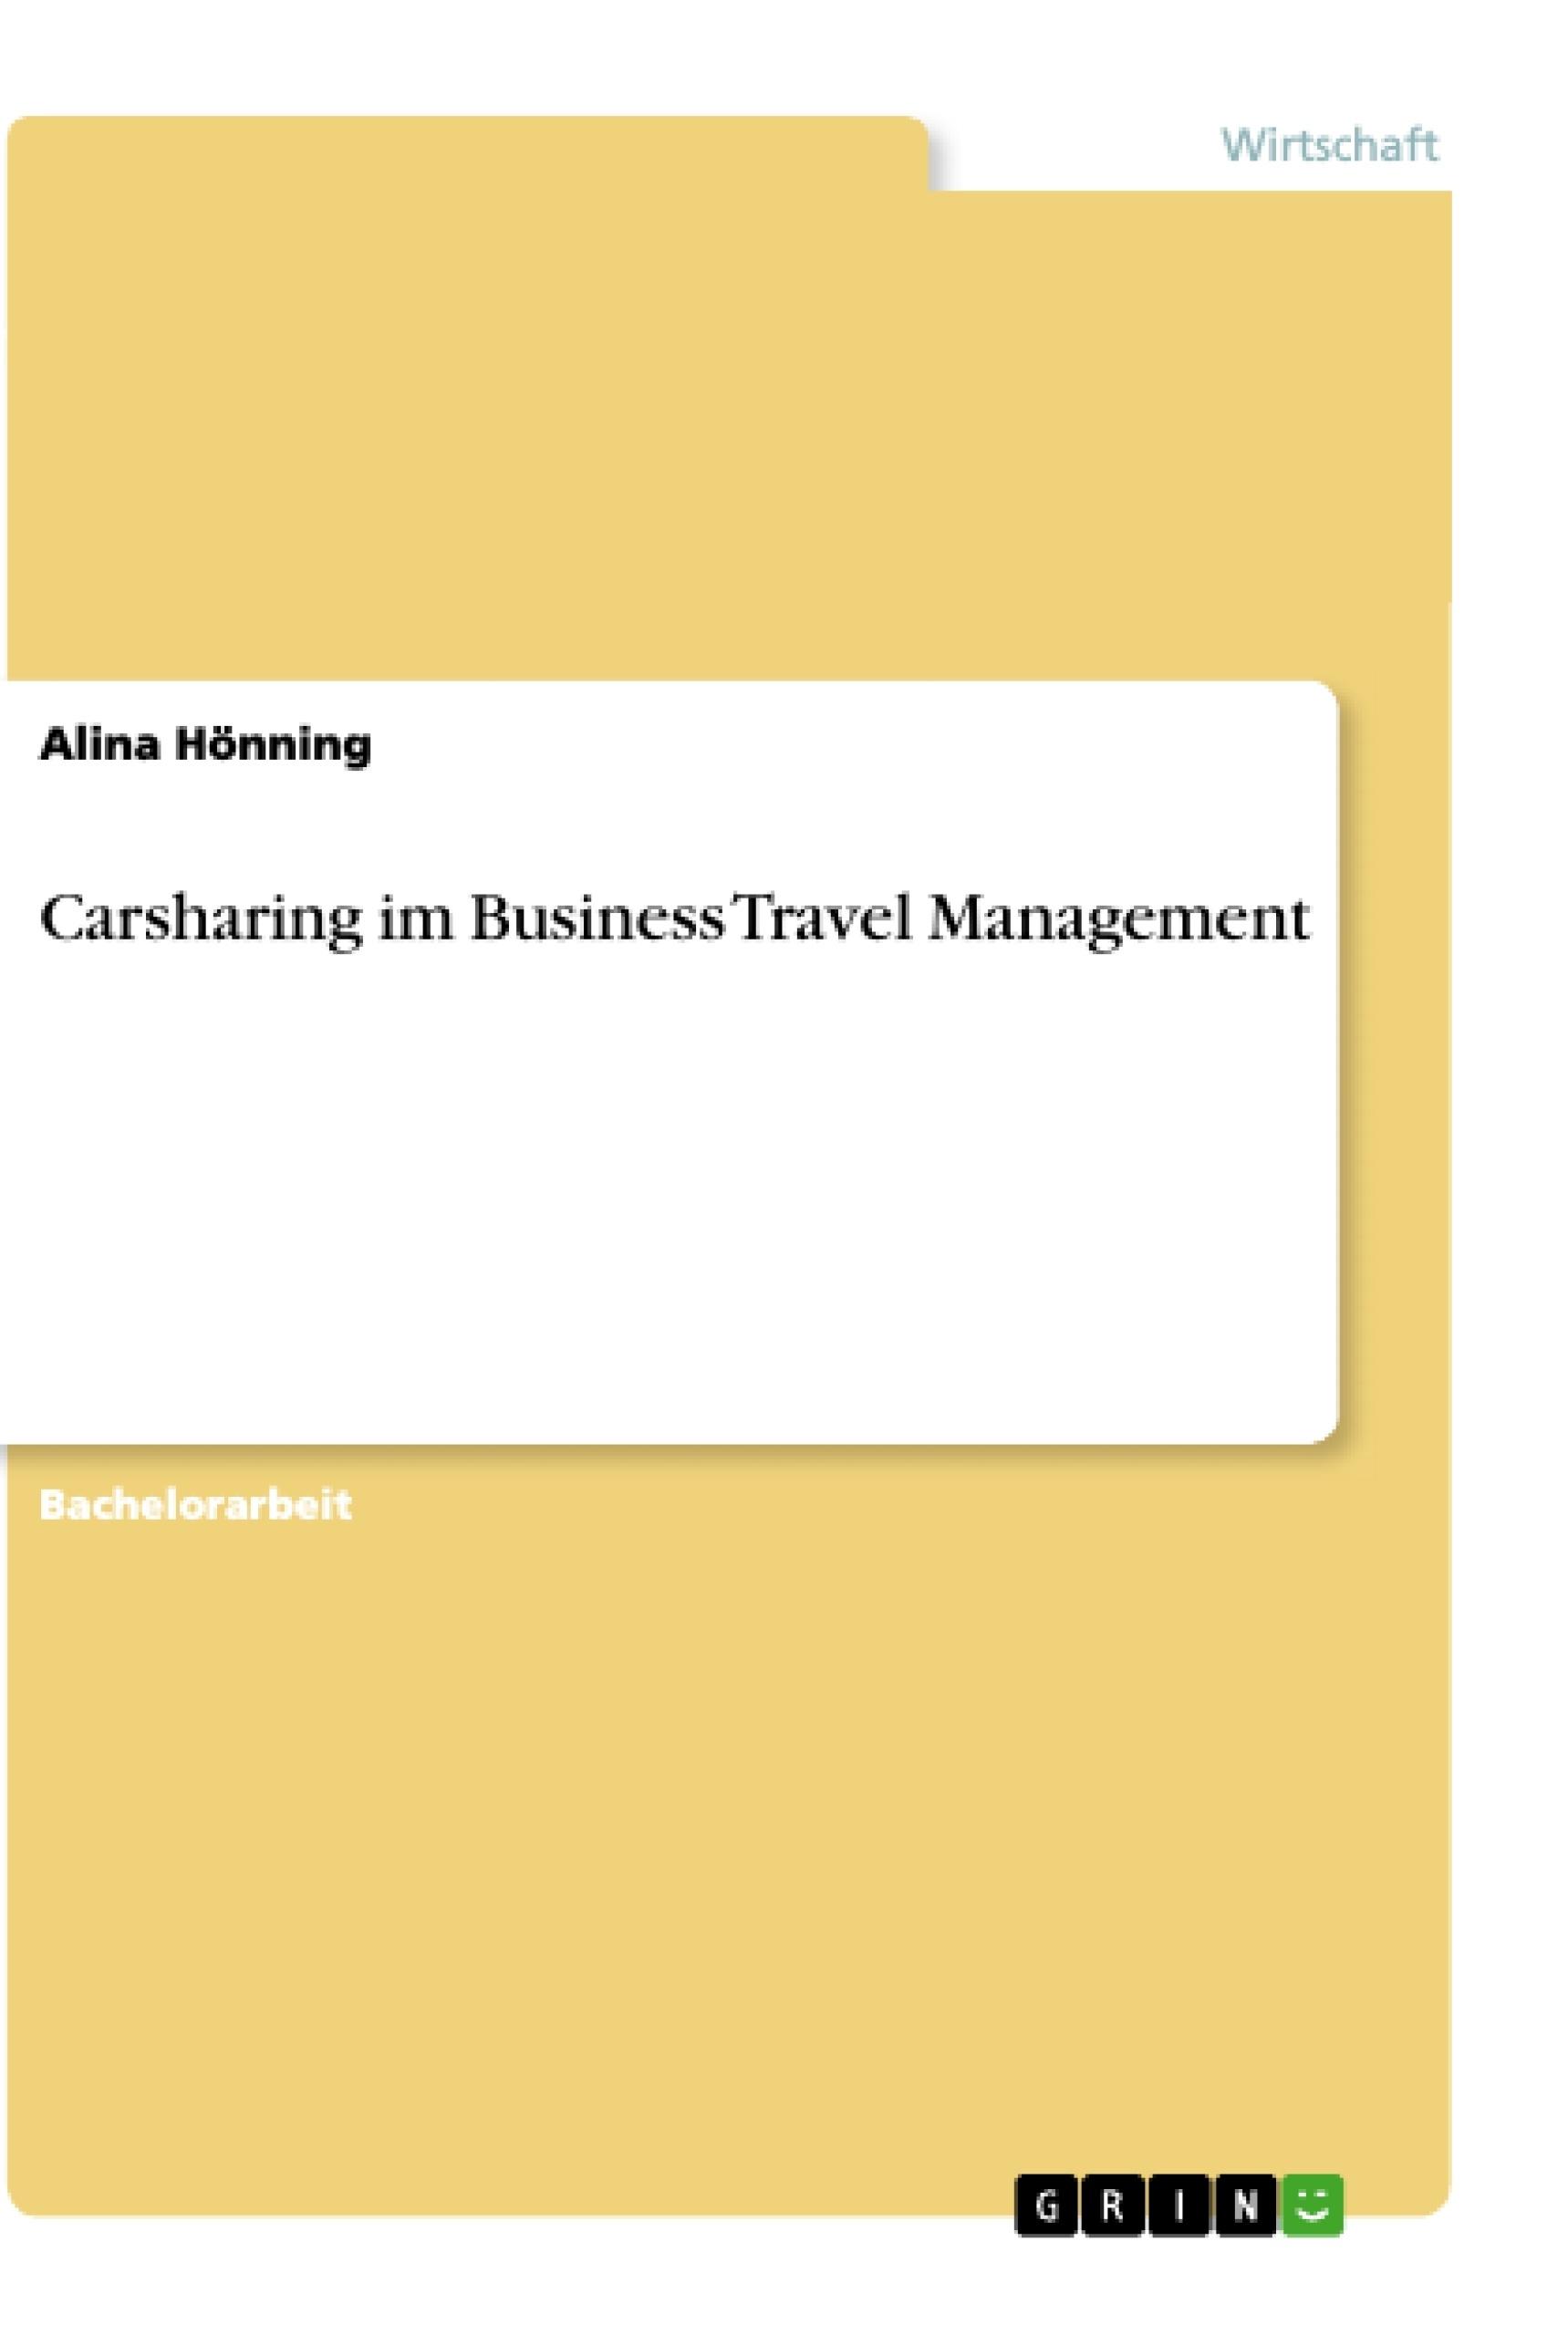 Titel: Carsharing im Business Travel Management